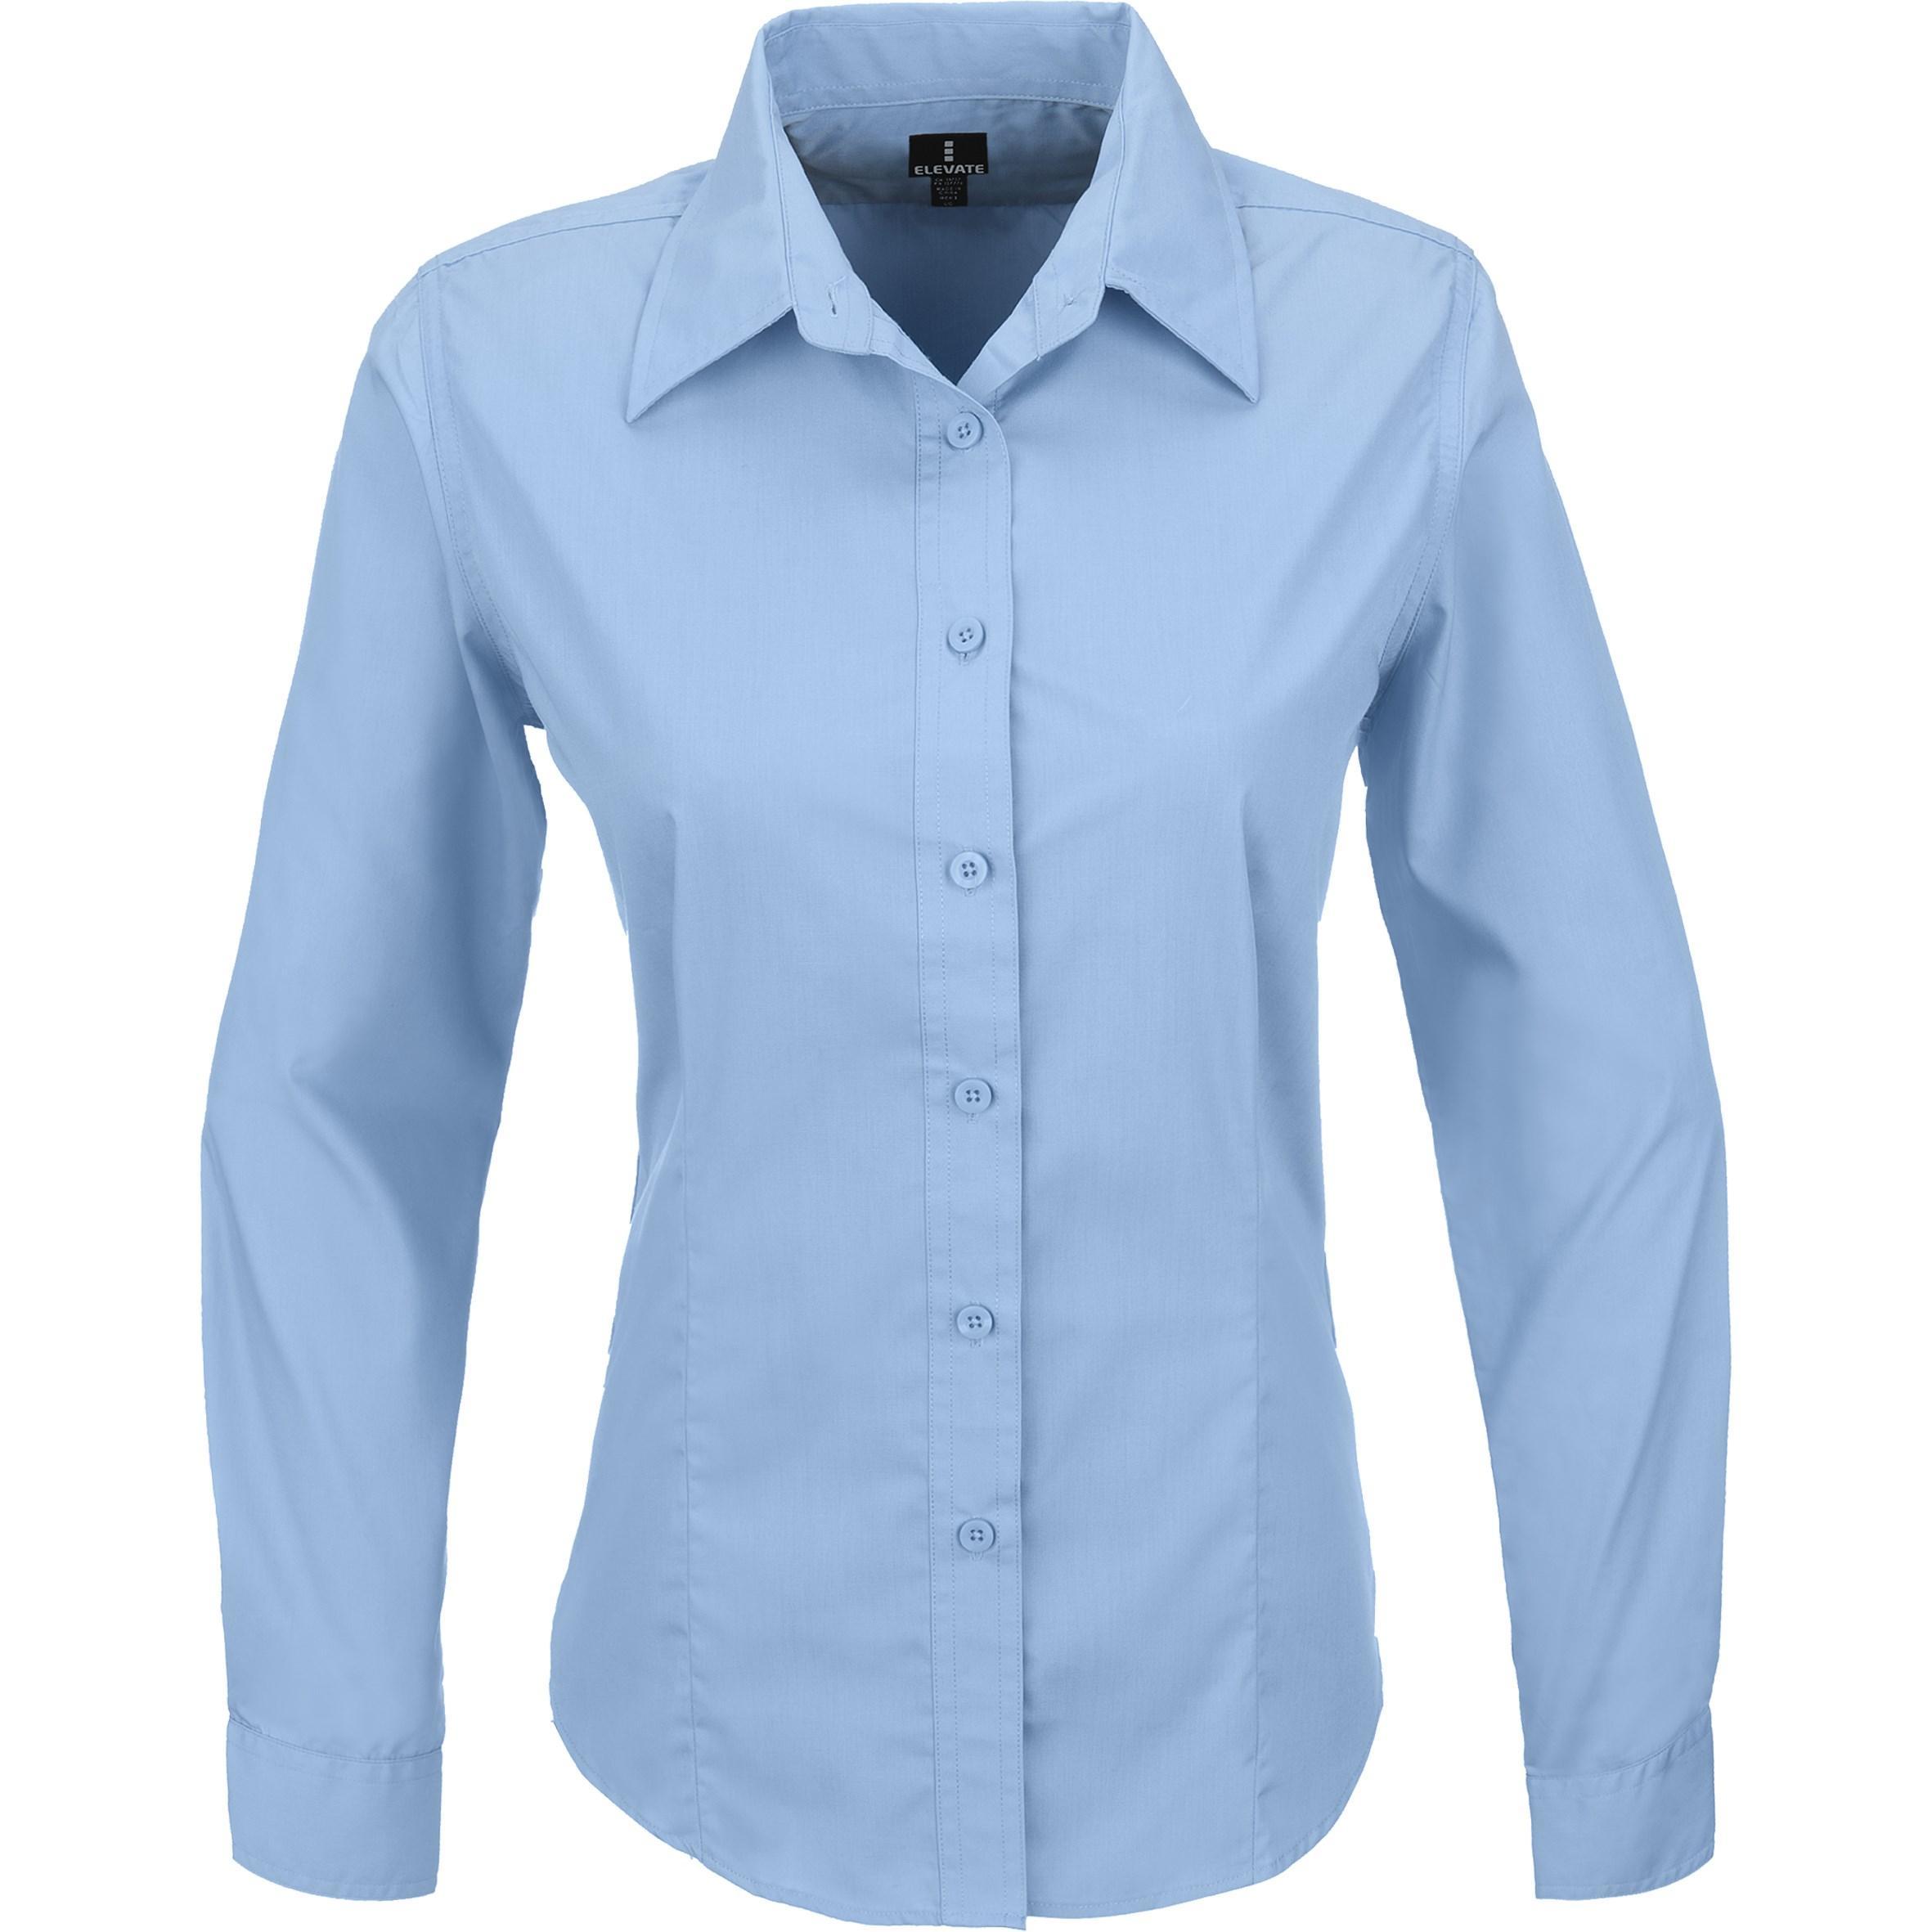 Ladies Long Sleeve Preston Shirt - Blue Only